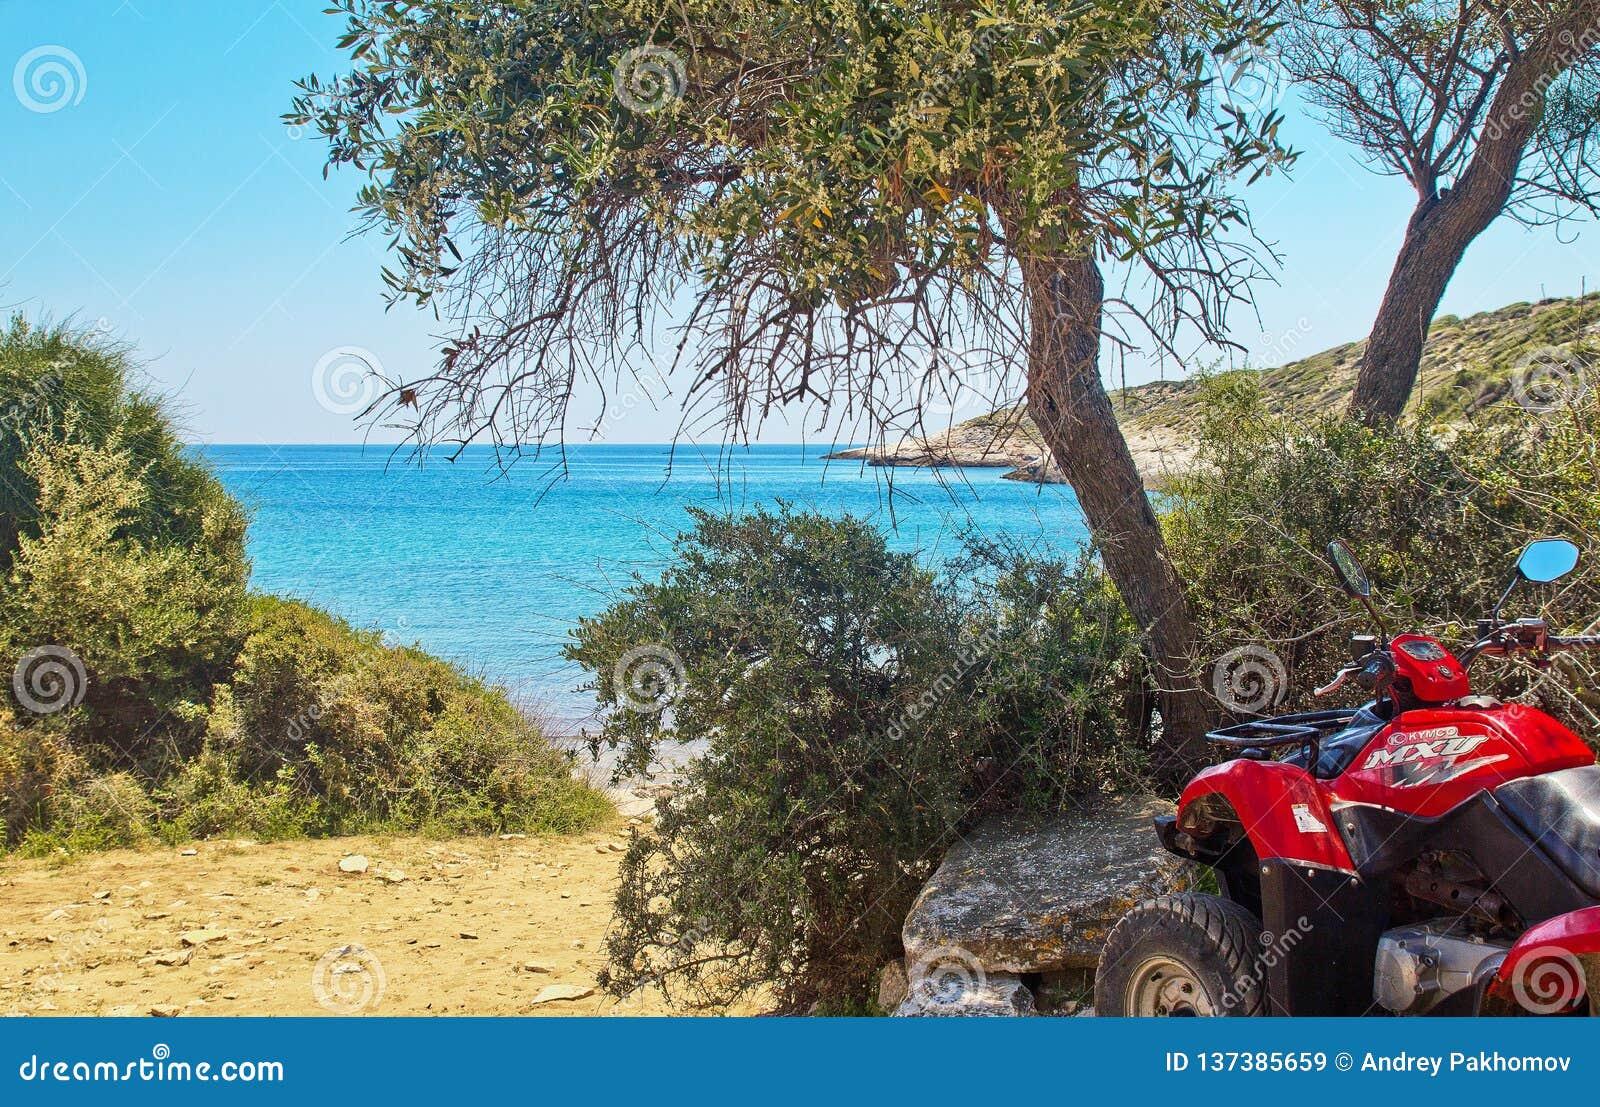 ATV припарковано на seashore на острове Thassos, Греции взгляд красивого пейзажа